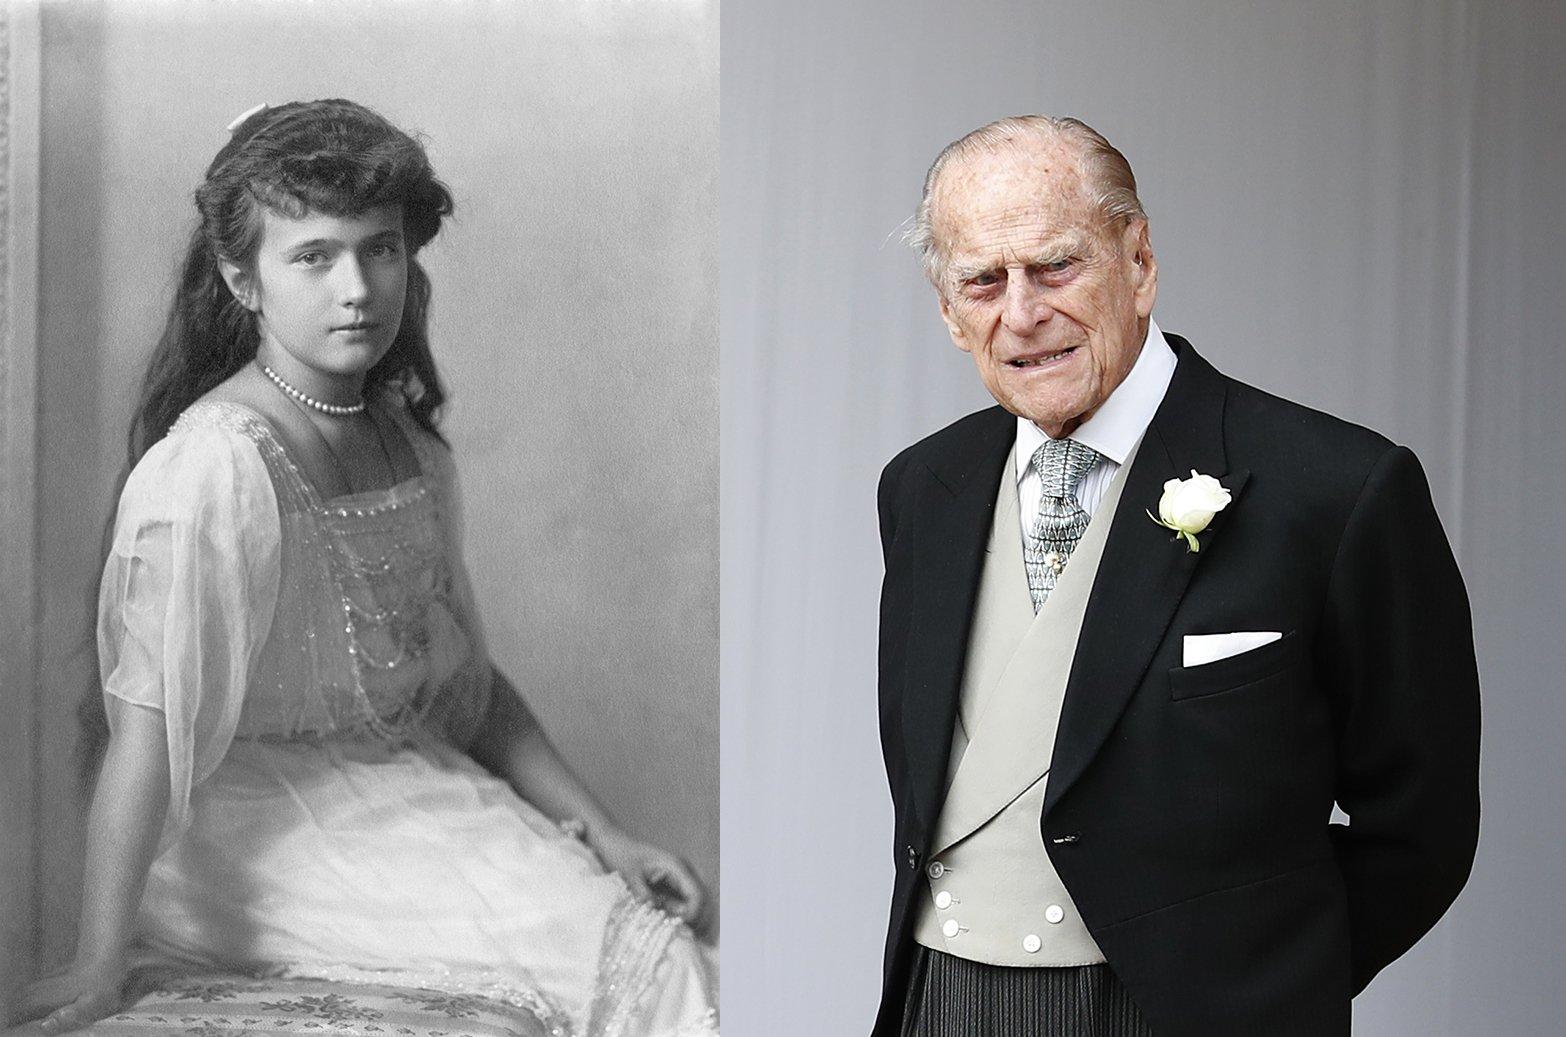 Anastasia Romanov and Prince Philip. I Image: Wikimedia Commons/ Getty Images.